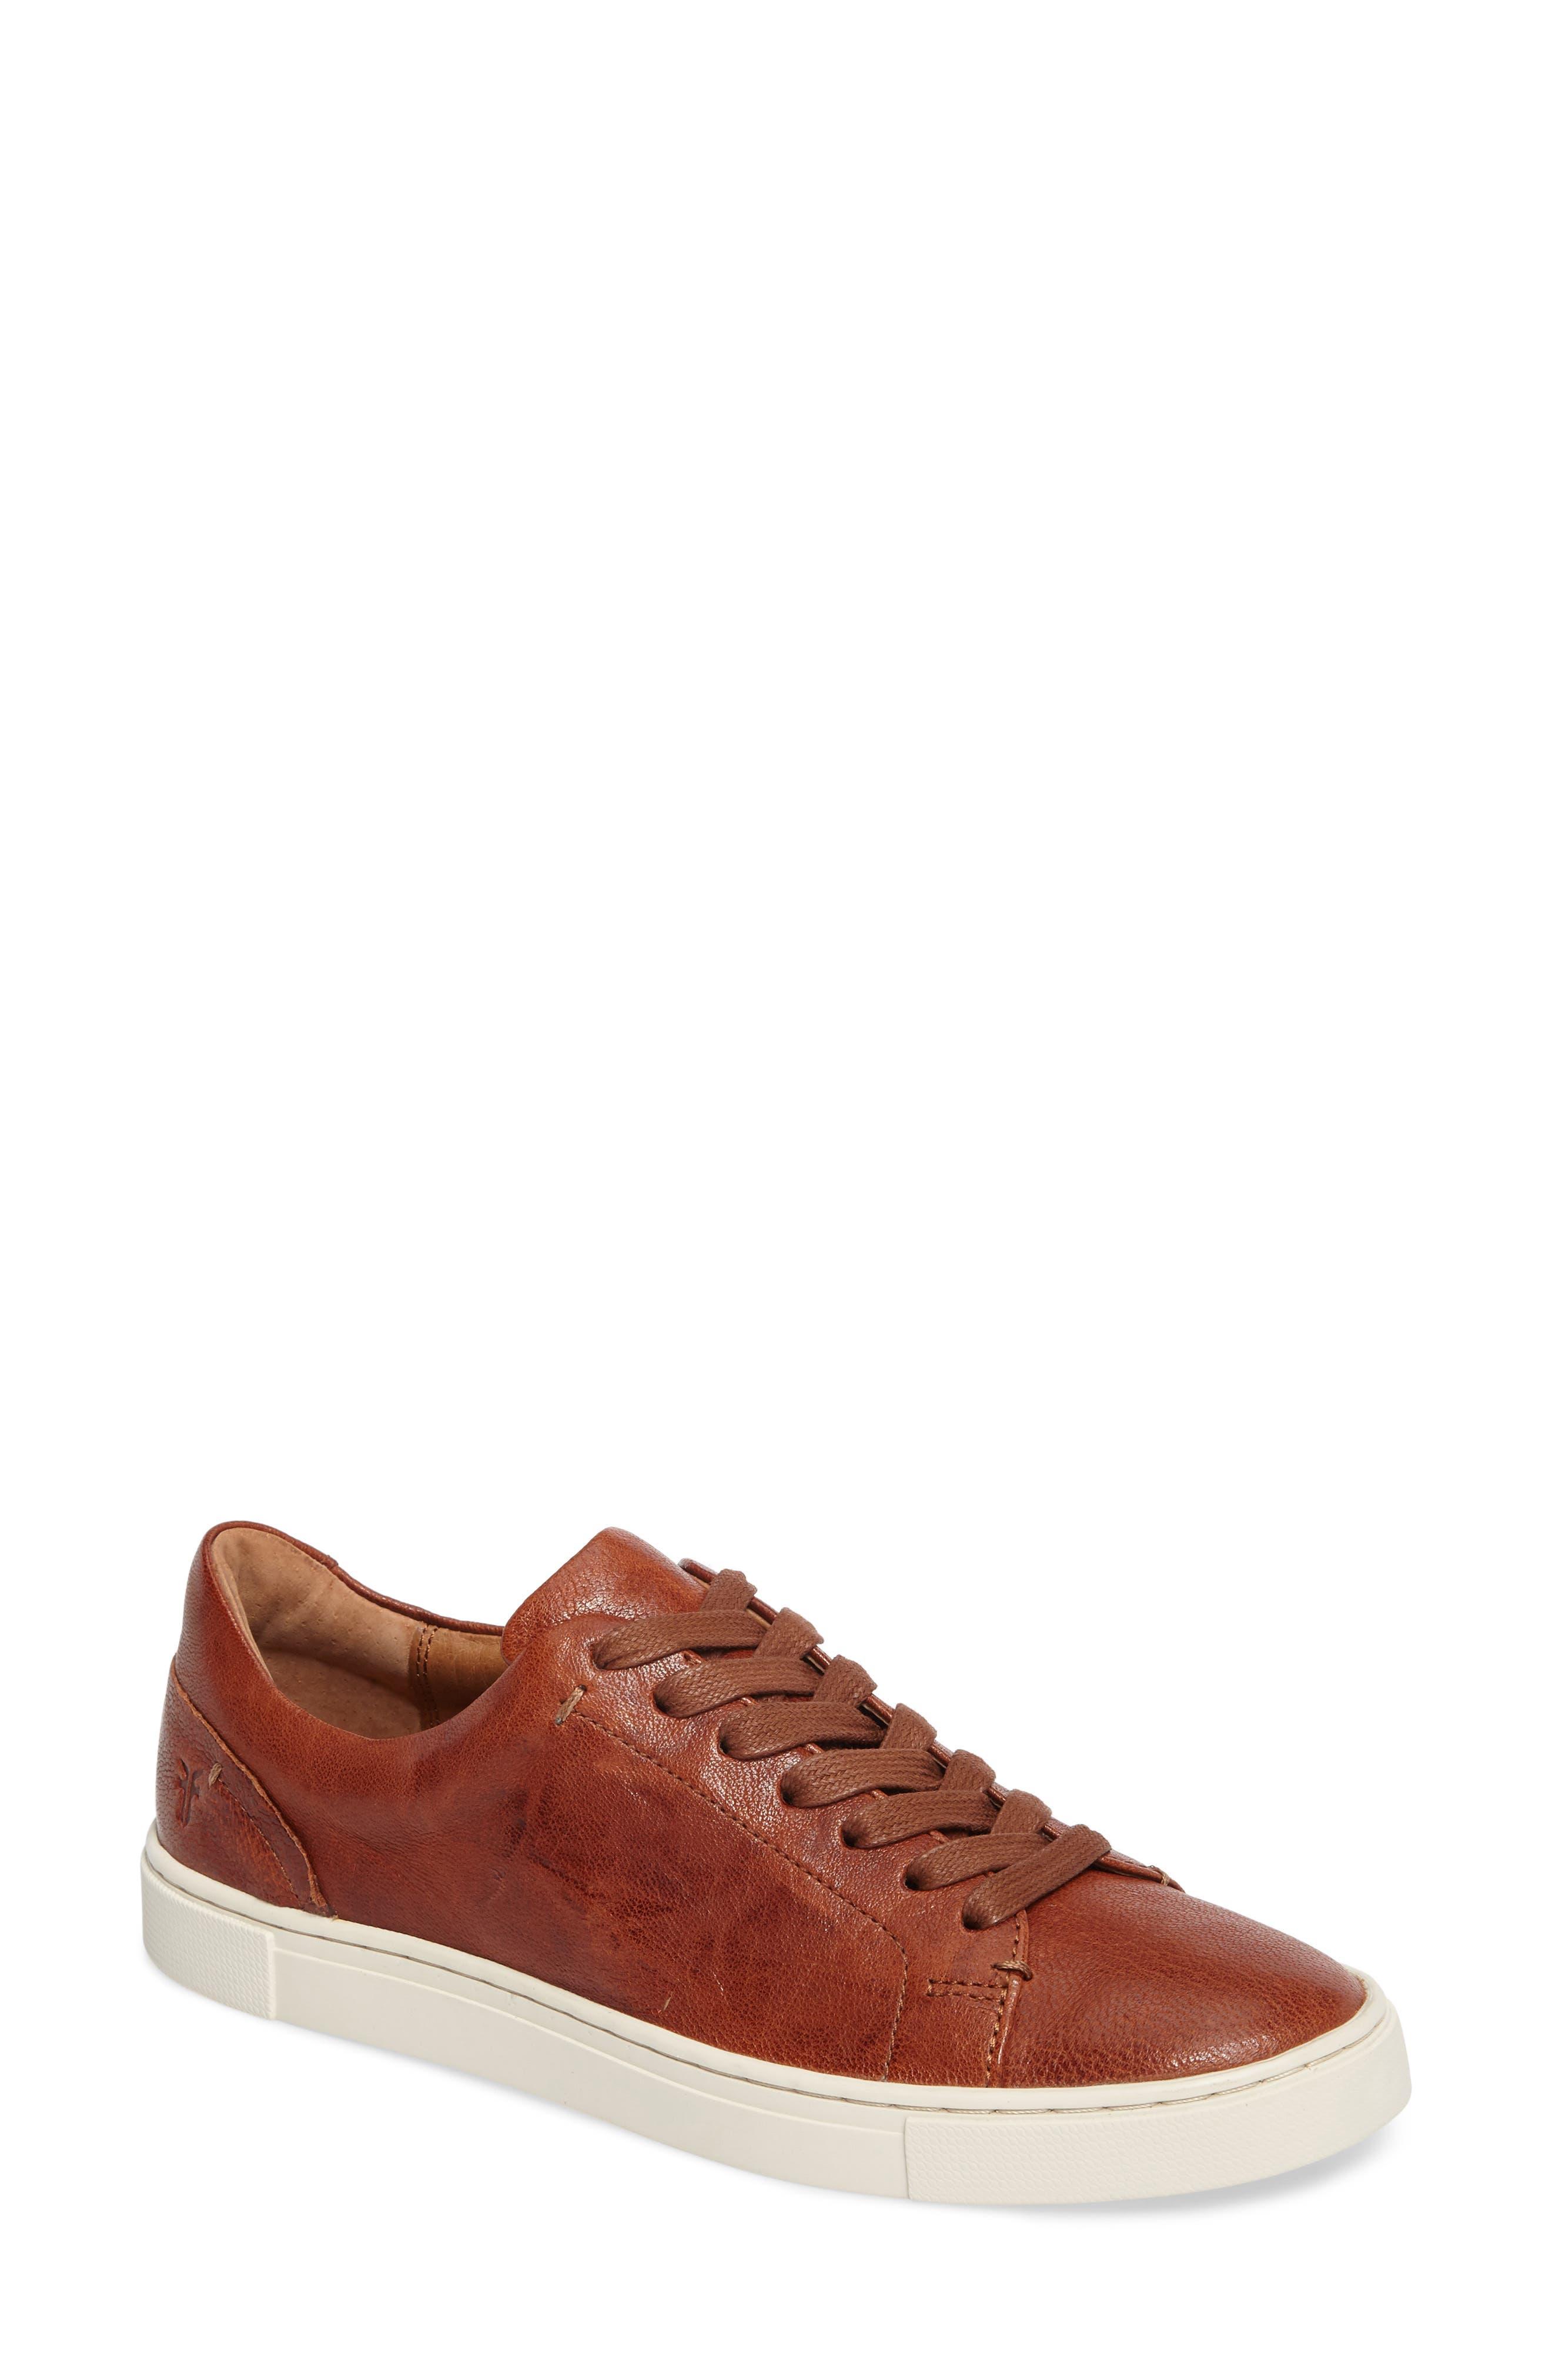 Ivy Sneaker,                             Main thumbnail 1, color,                             235